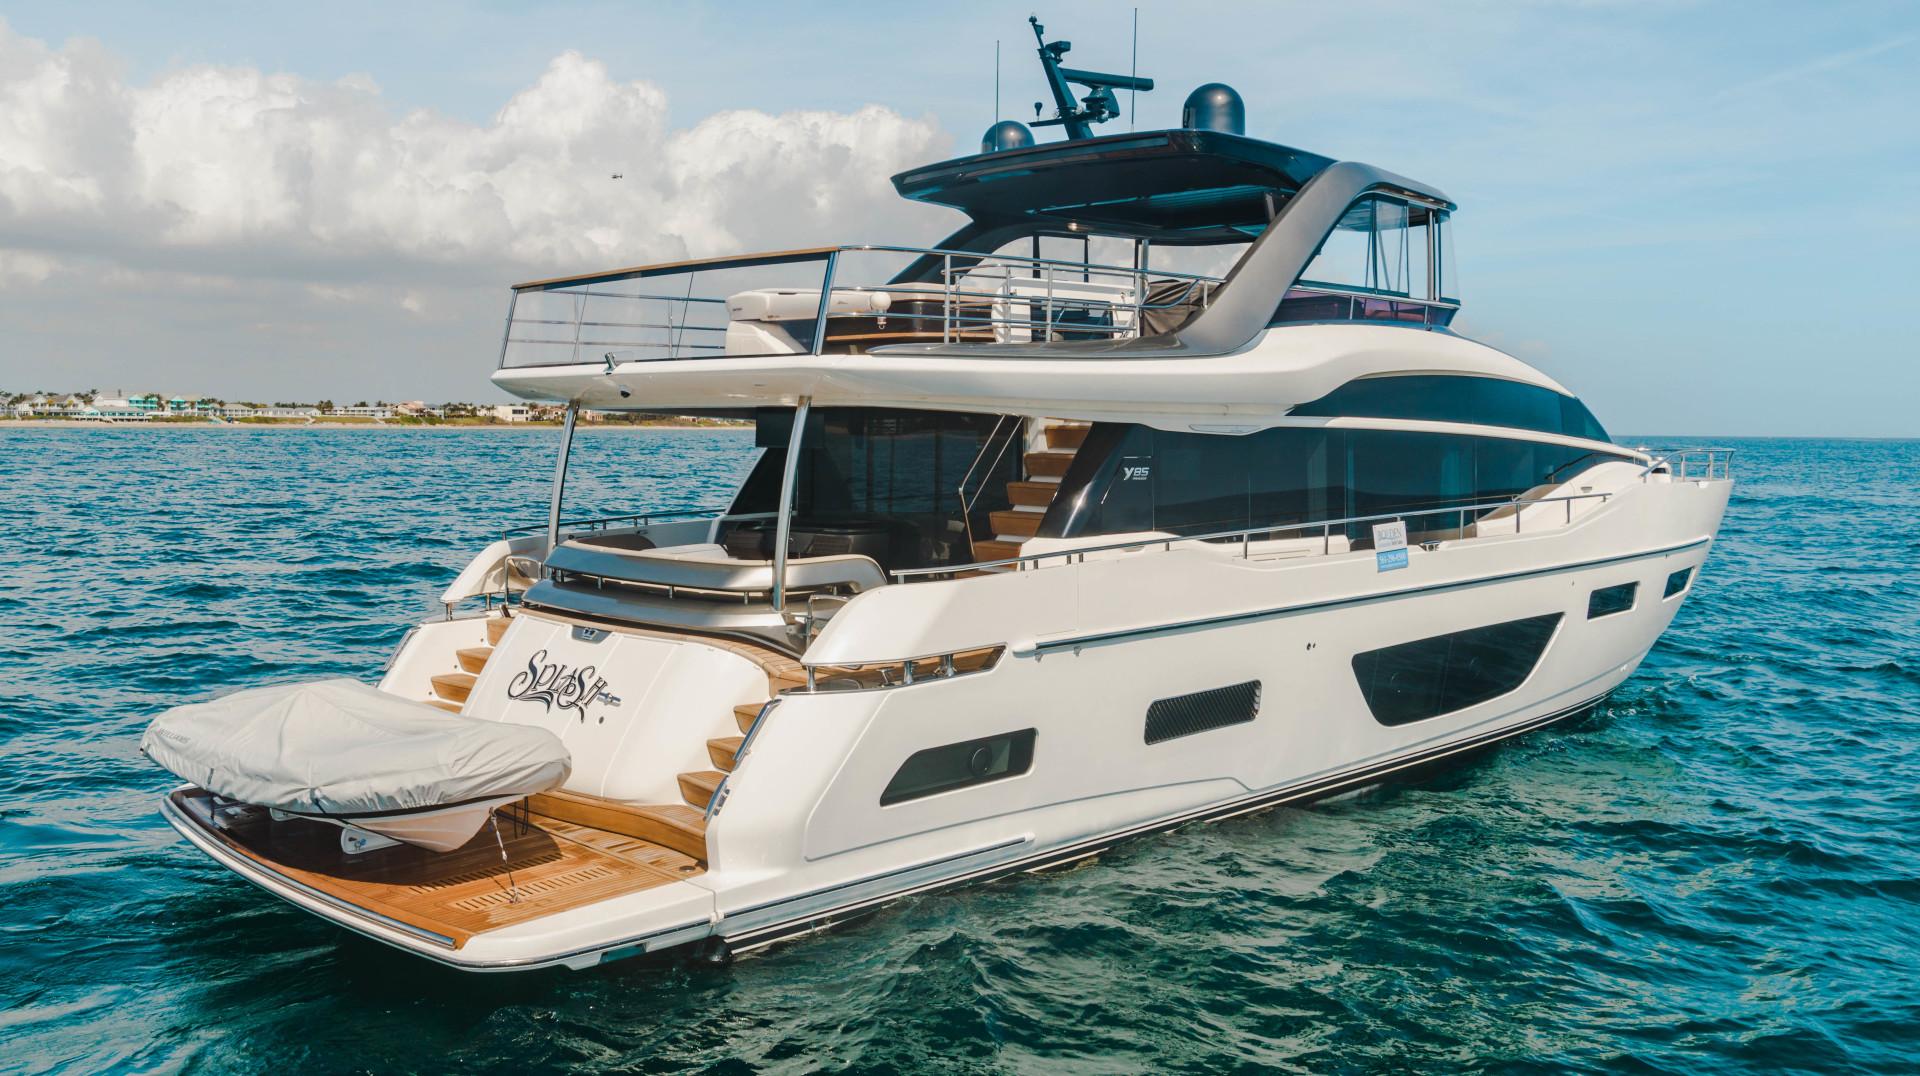 Princess-Y85  2019-Splash Delray Beach-Florida-United States-1631582 | Thumbnail